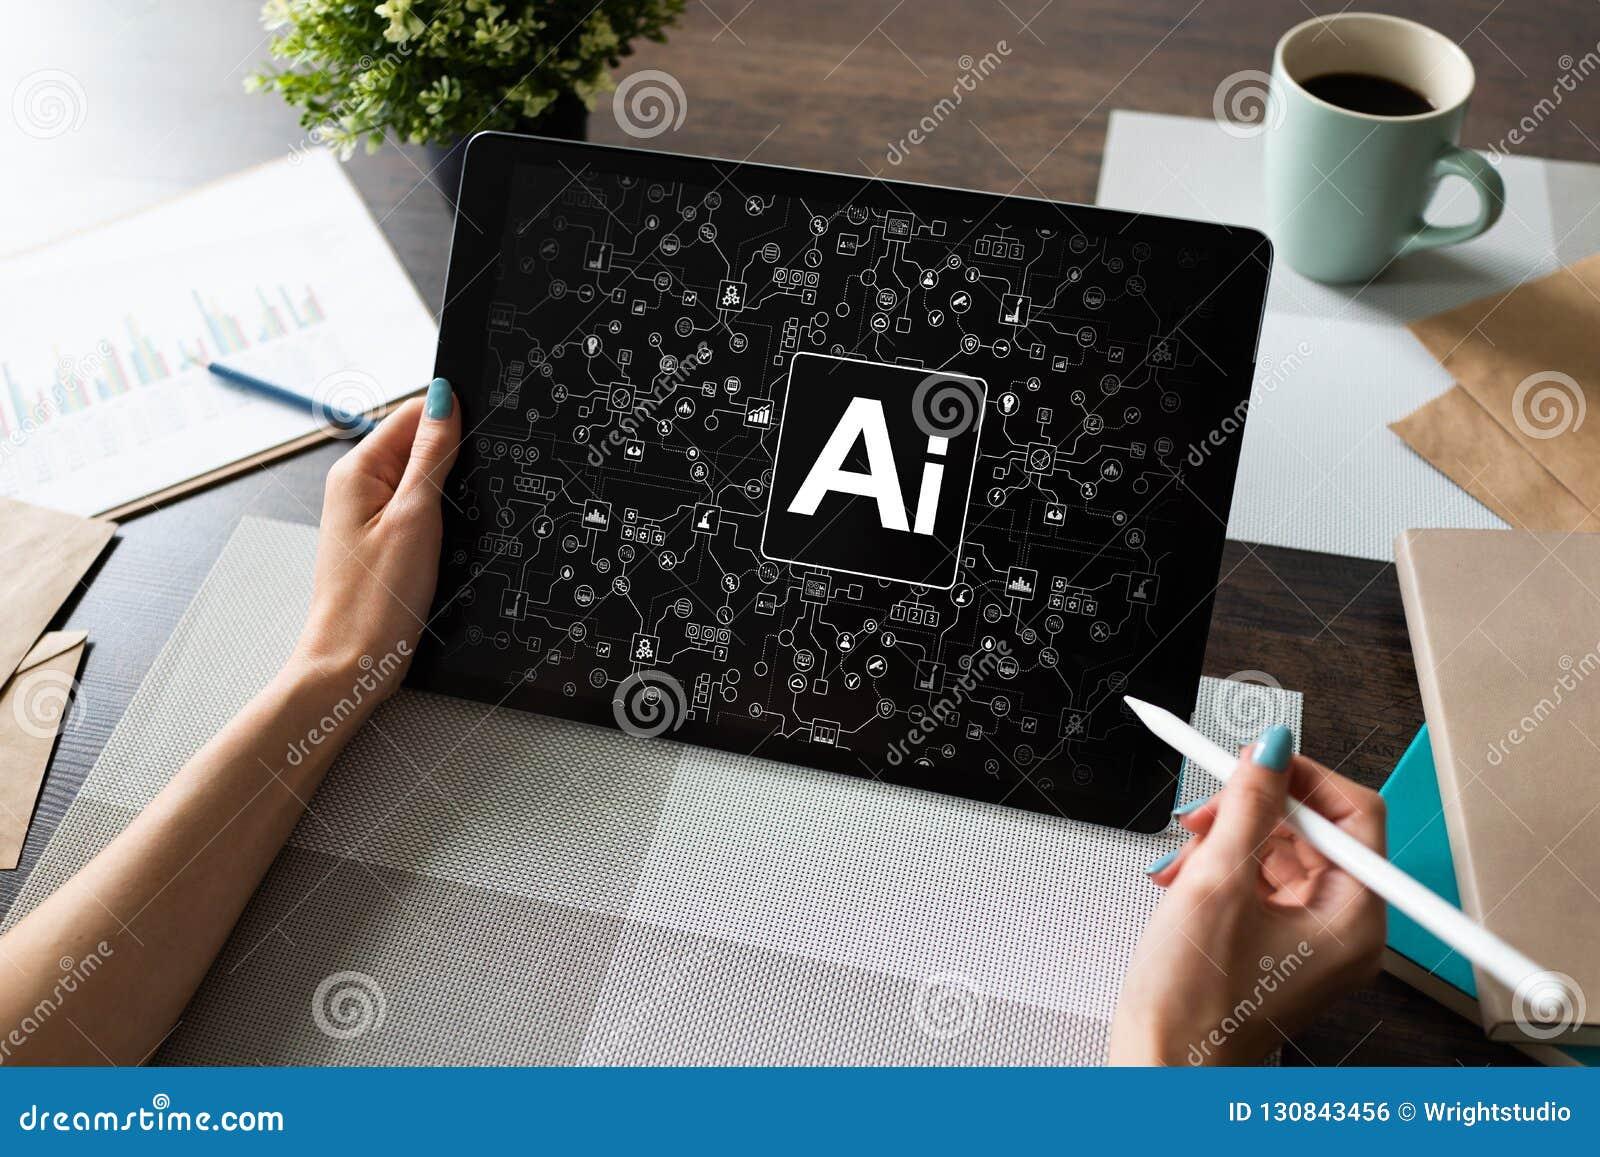 AI -人工智能、互联网、IOT和自动化概念